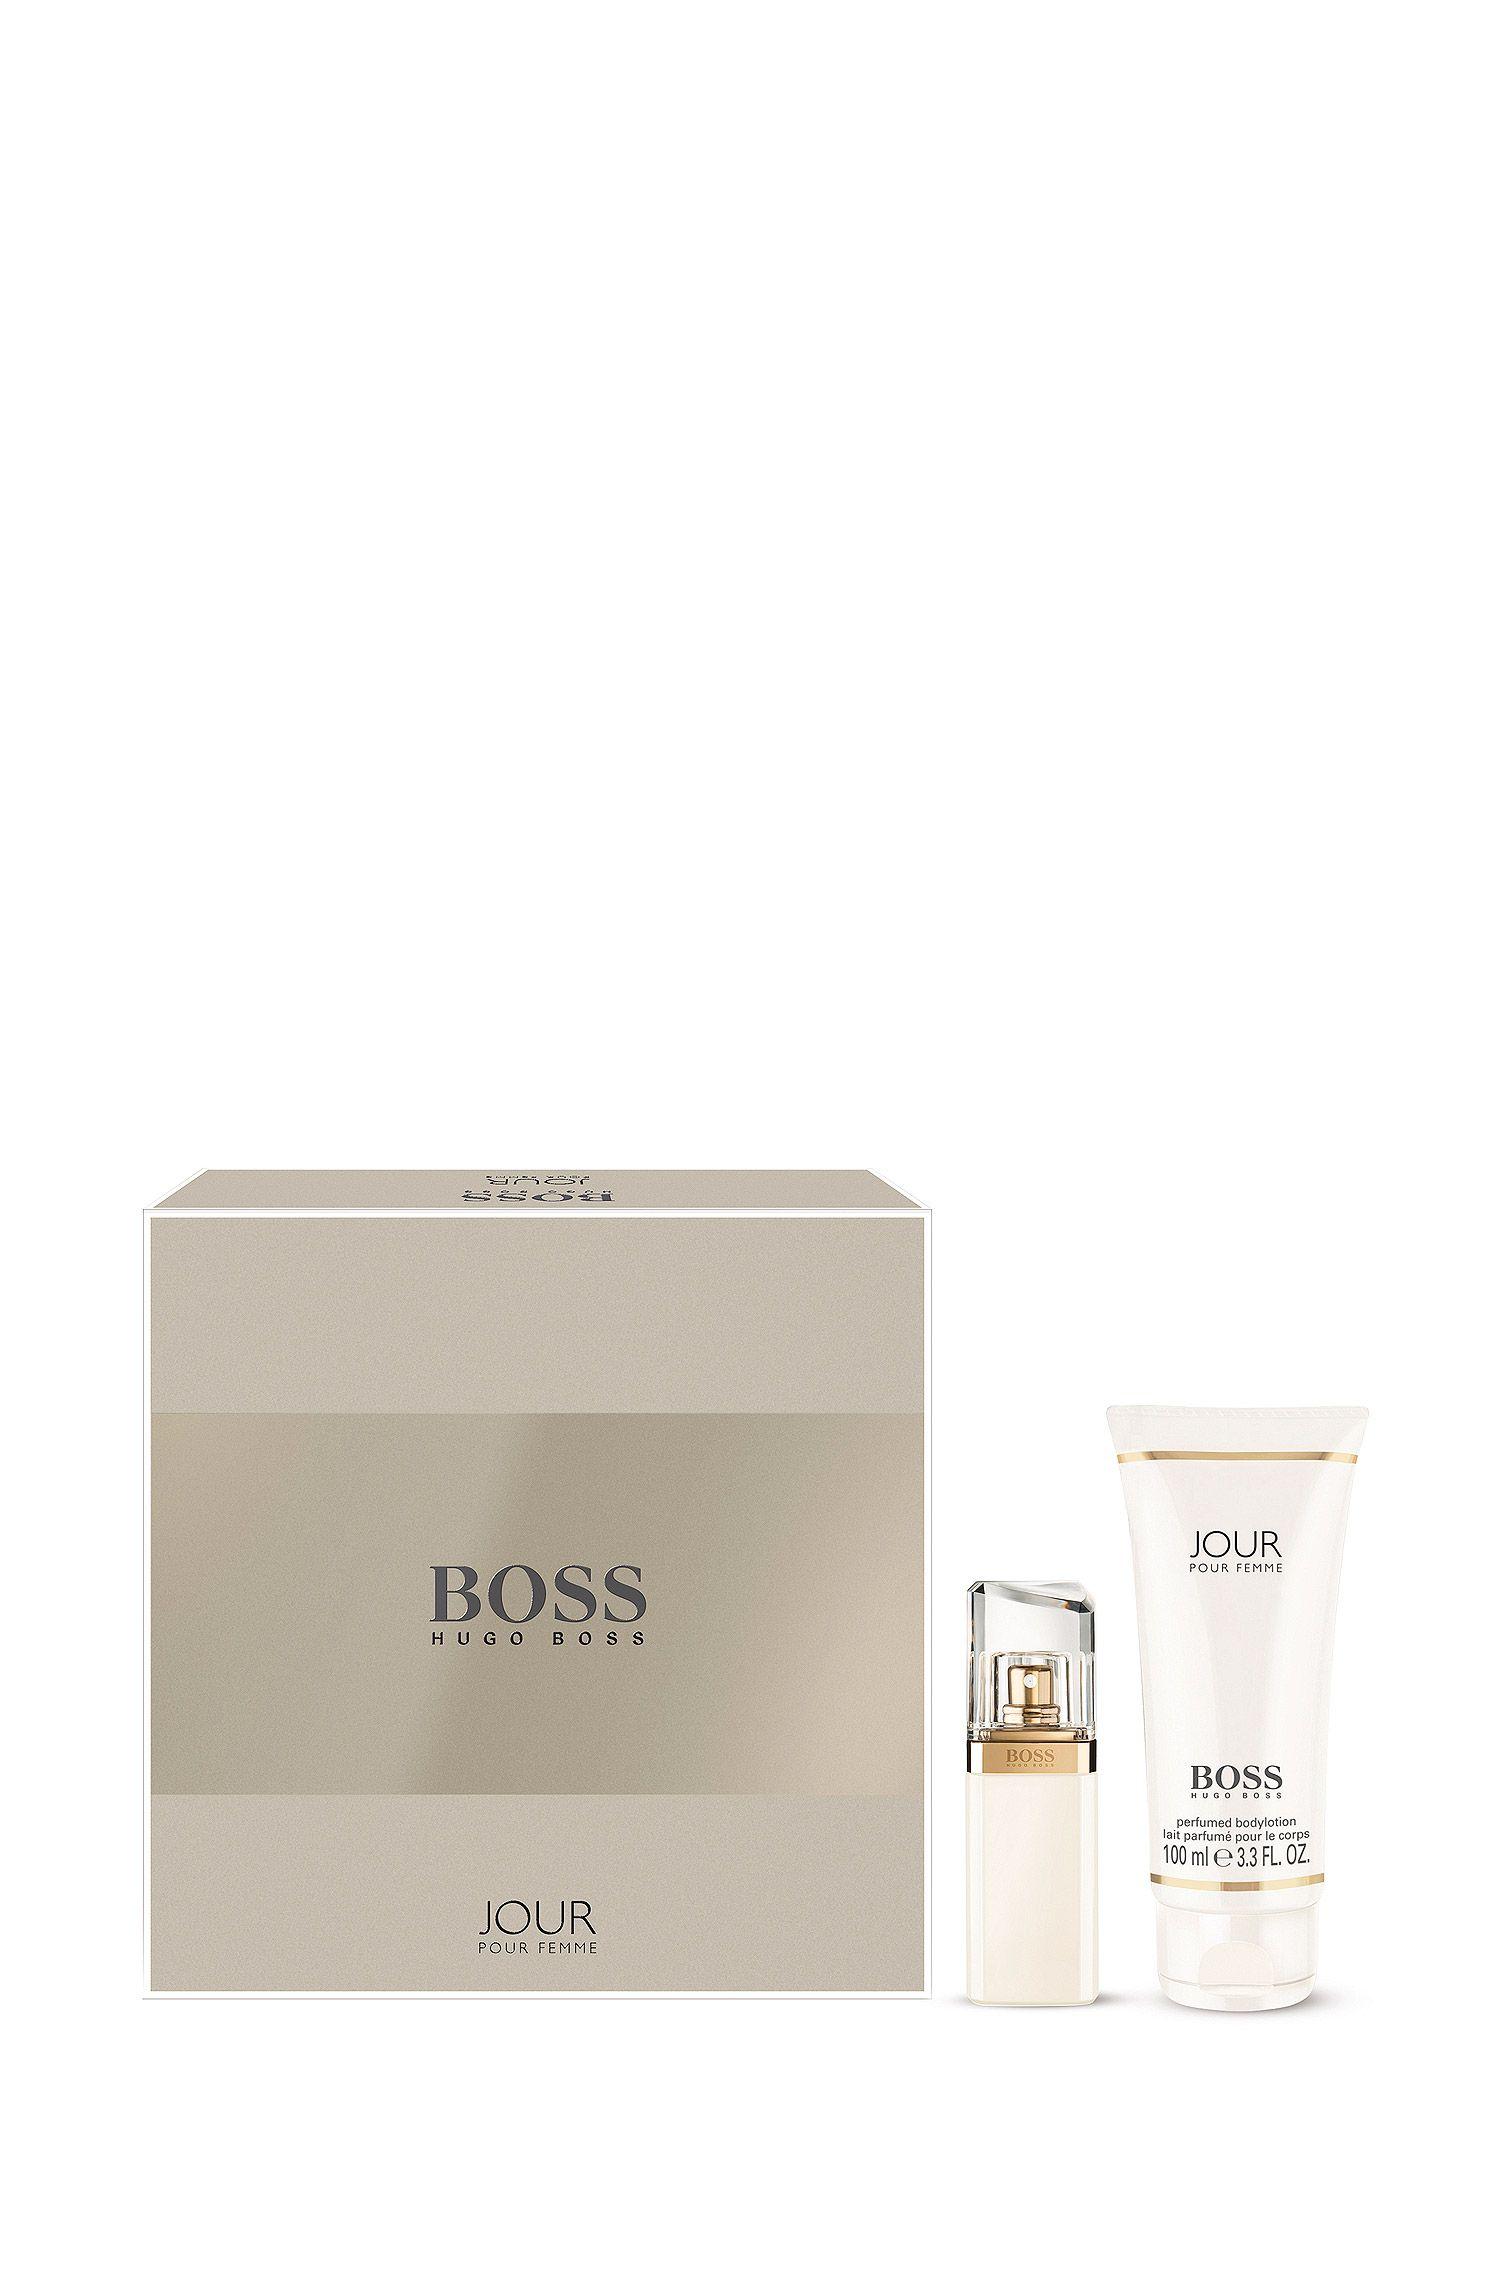 Set regalo 'BOSS Jour' con Eau de Parfum (30ml) e lozione corpo